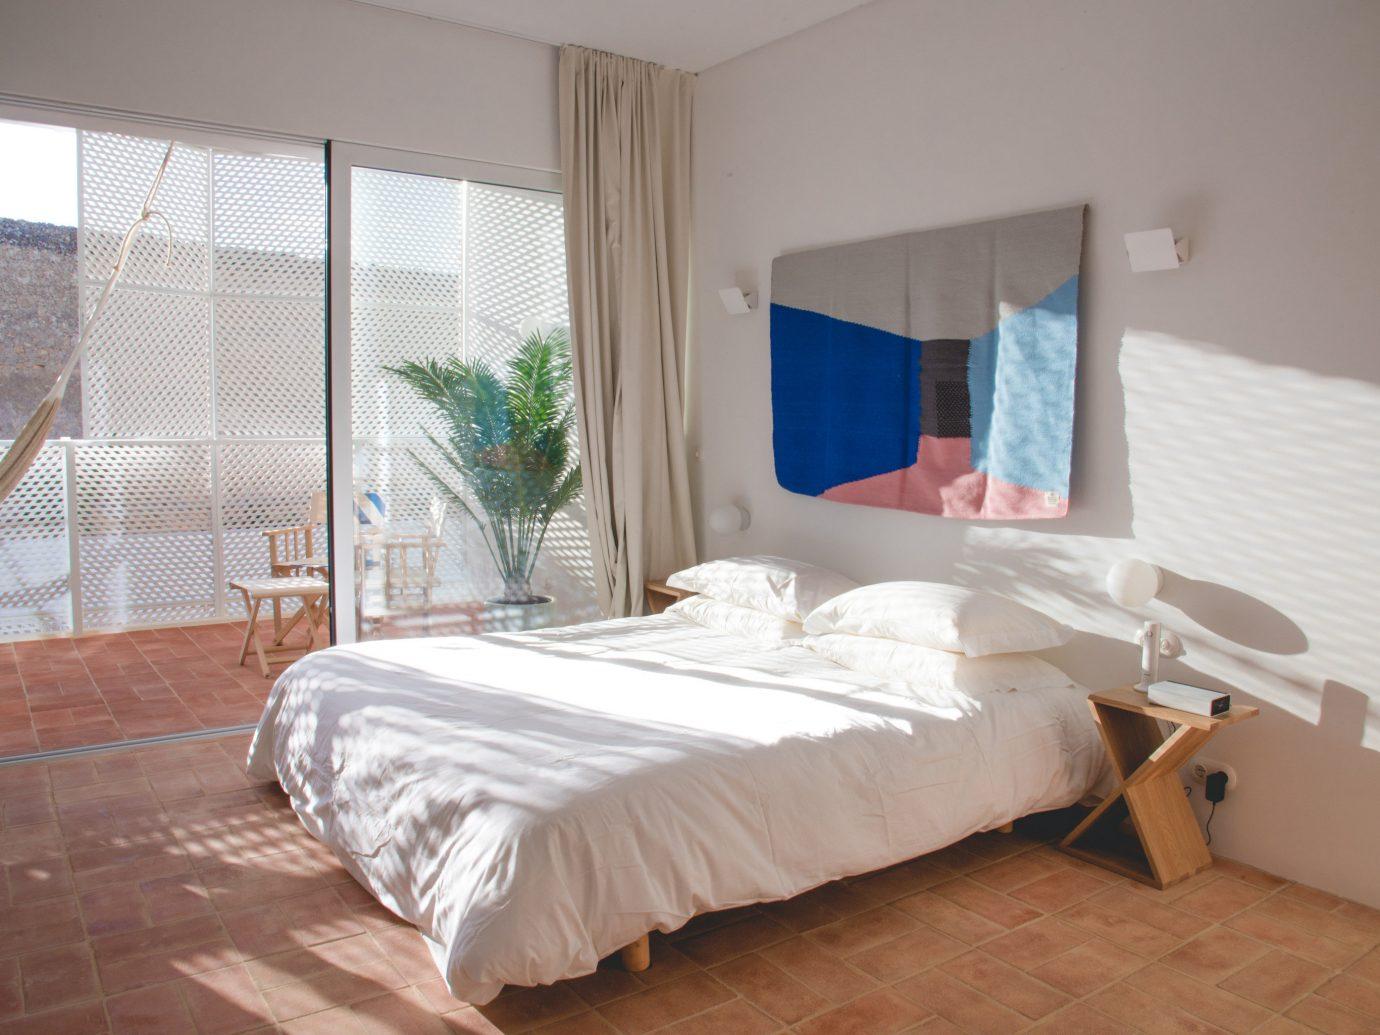 Hotels indoor bed window floor wall Bedroom room property cottage interior design Suite furniture real estate apartment hotel Villa bed frame